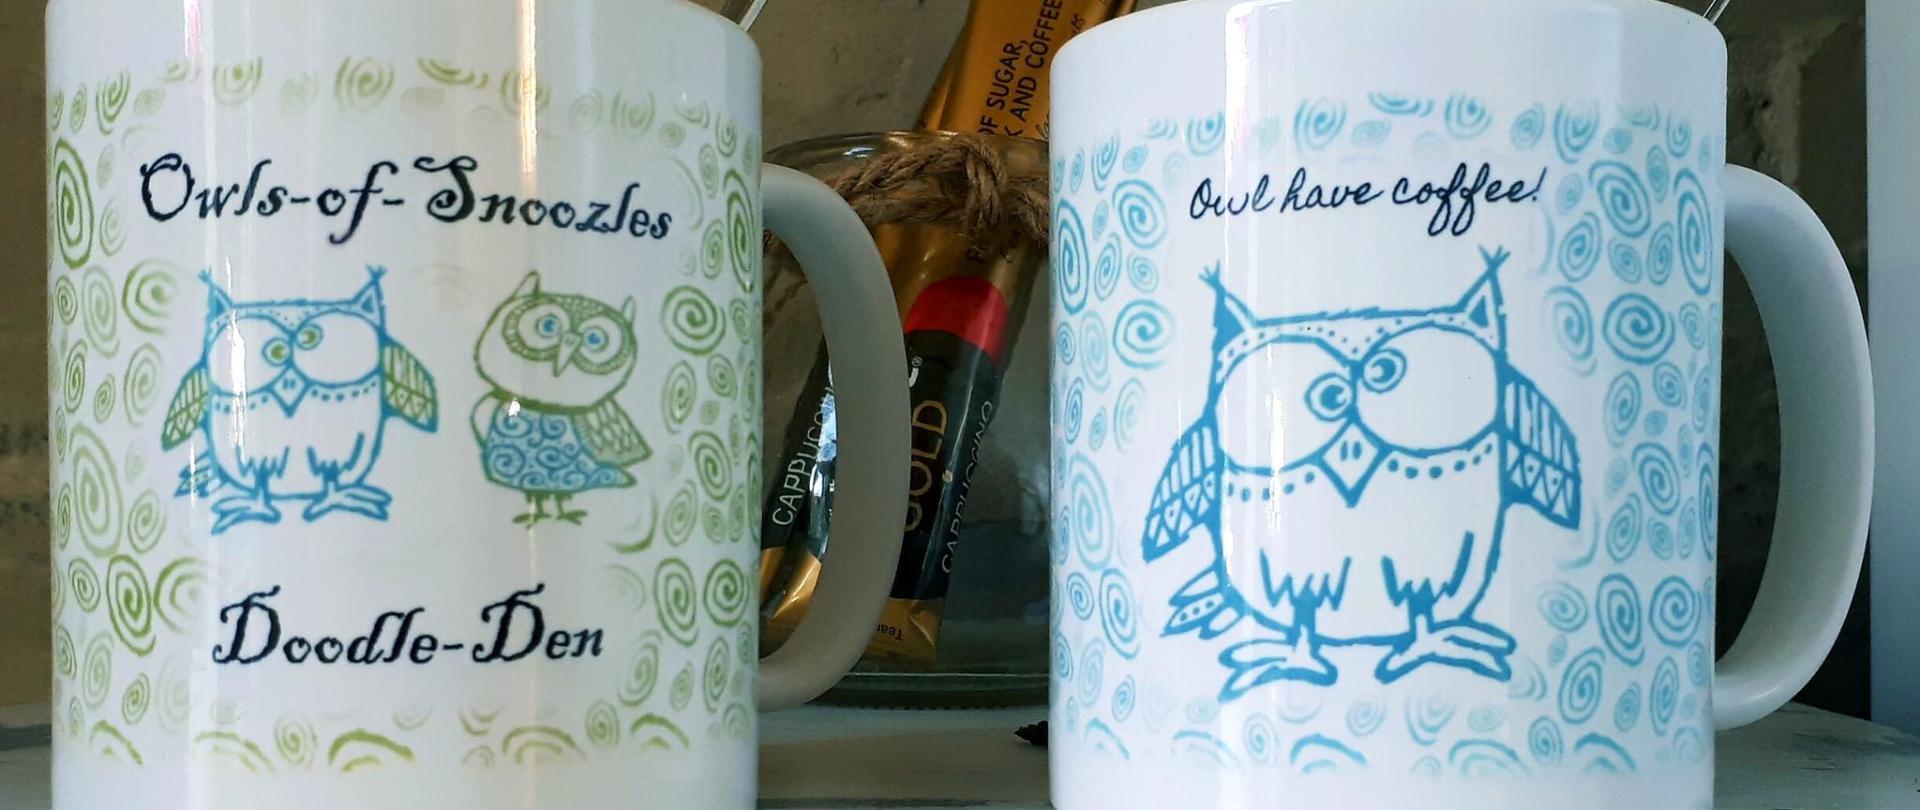 Custom made coffee mugs!